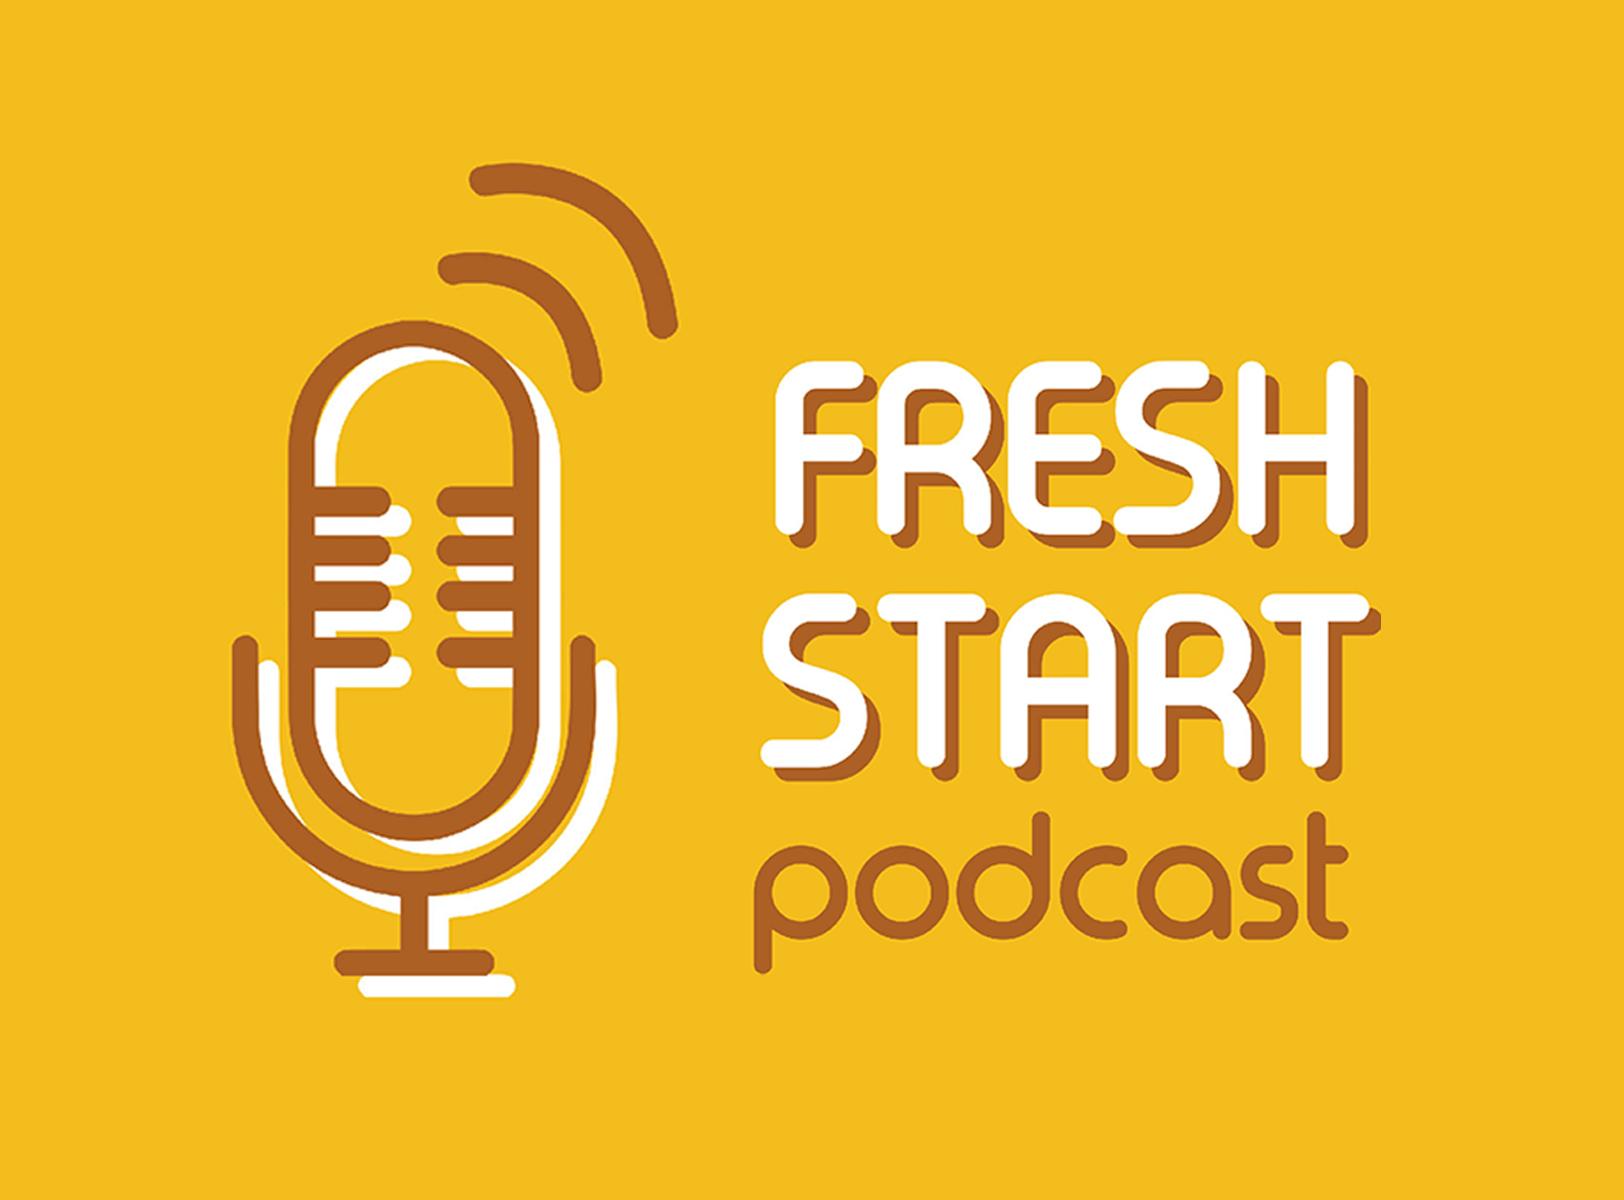 Fresh Start: Podcast News (10/16/2018 Tue.)